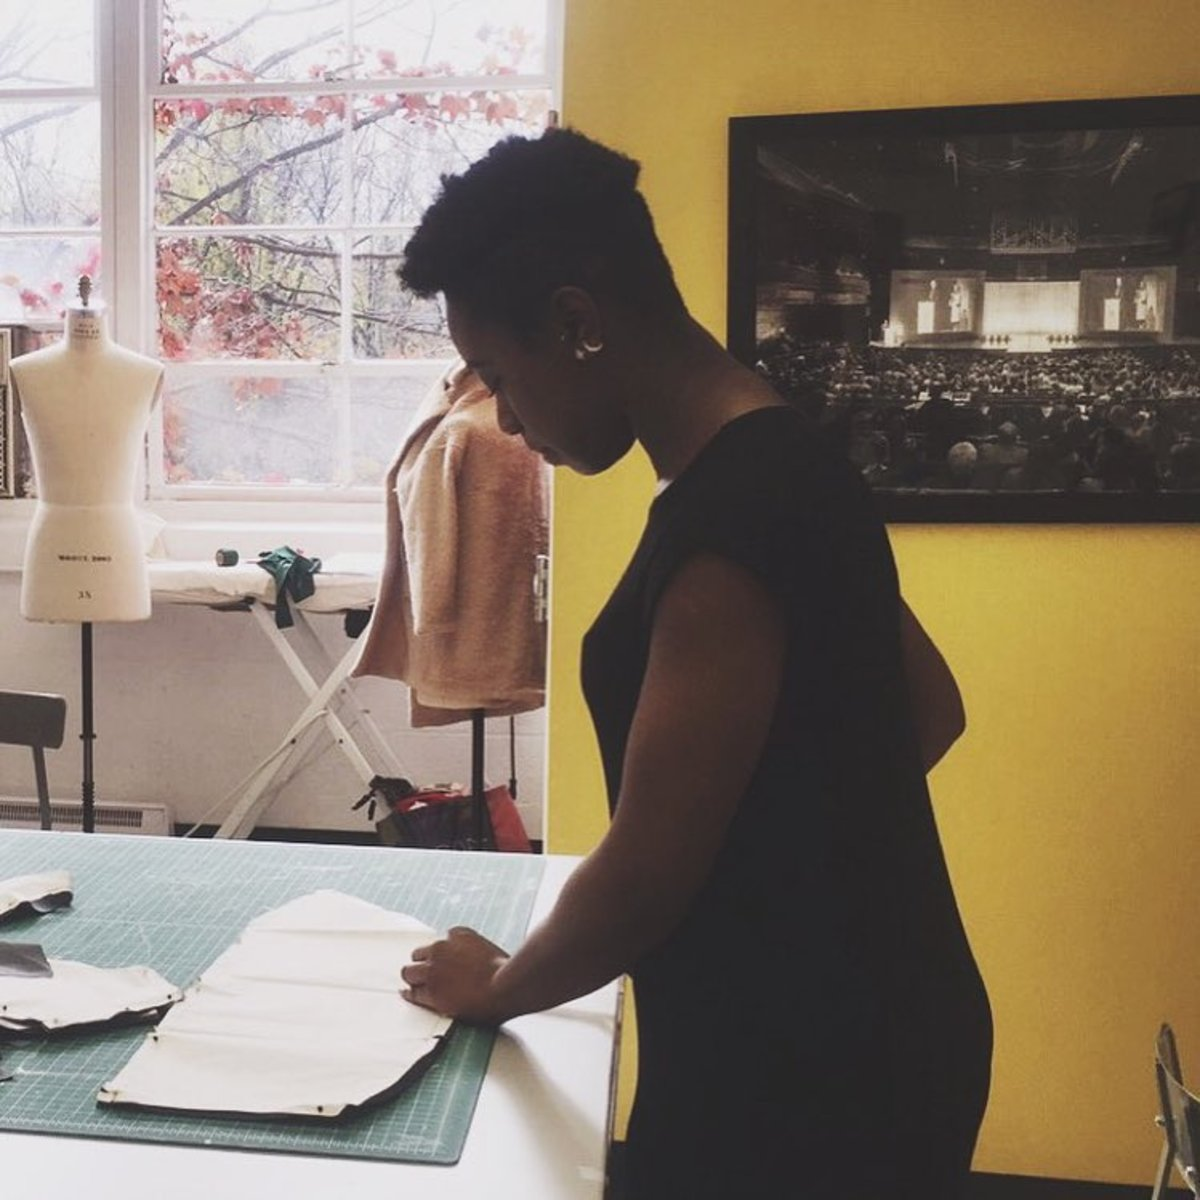 A PhilaU fashion student. Photo: @philau_fashiondesign/Instagram